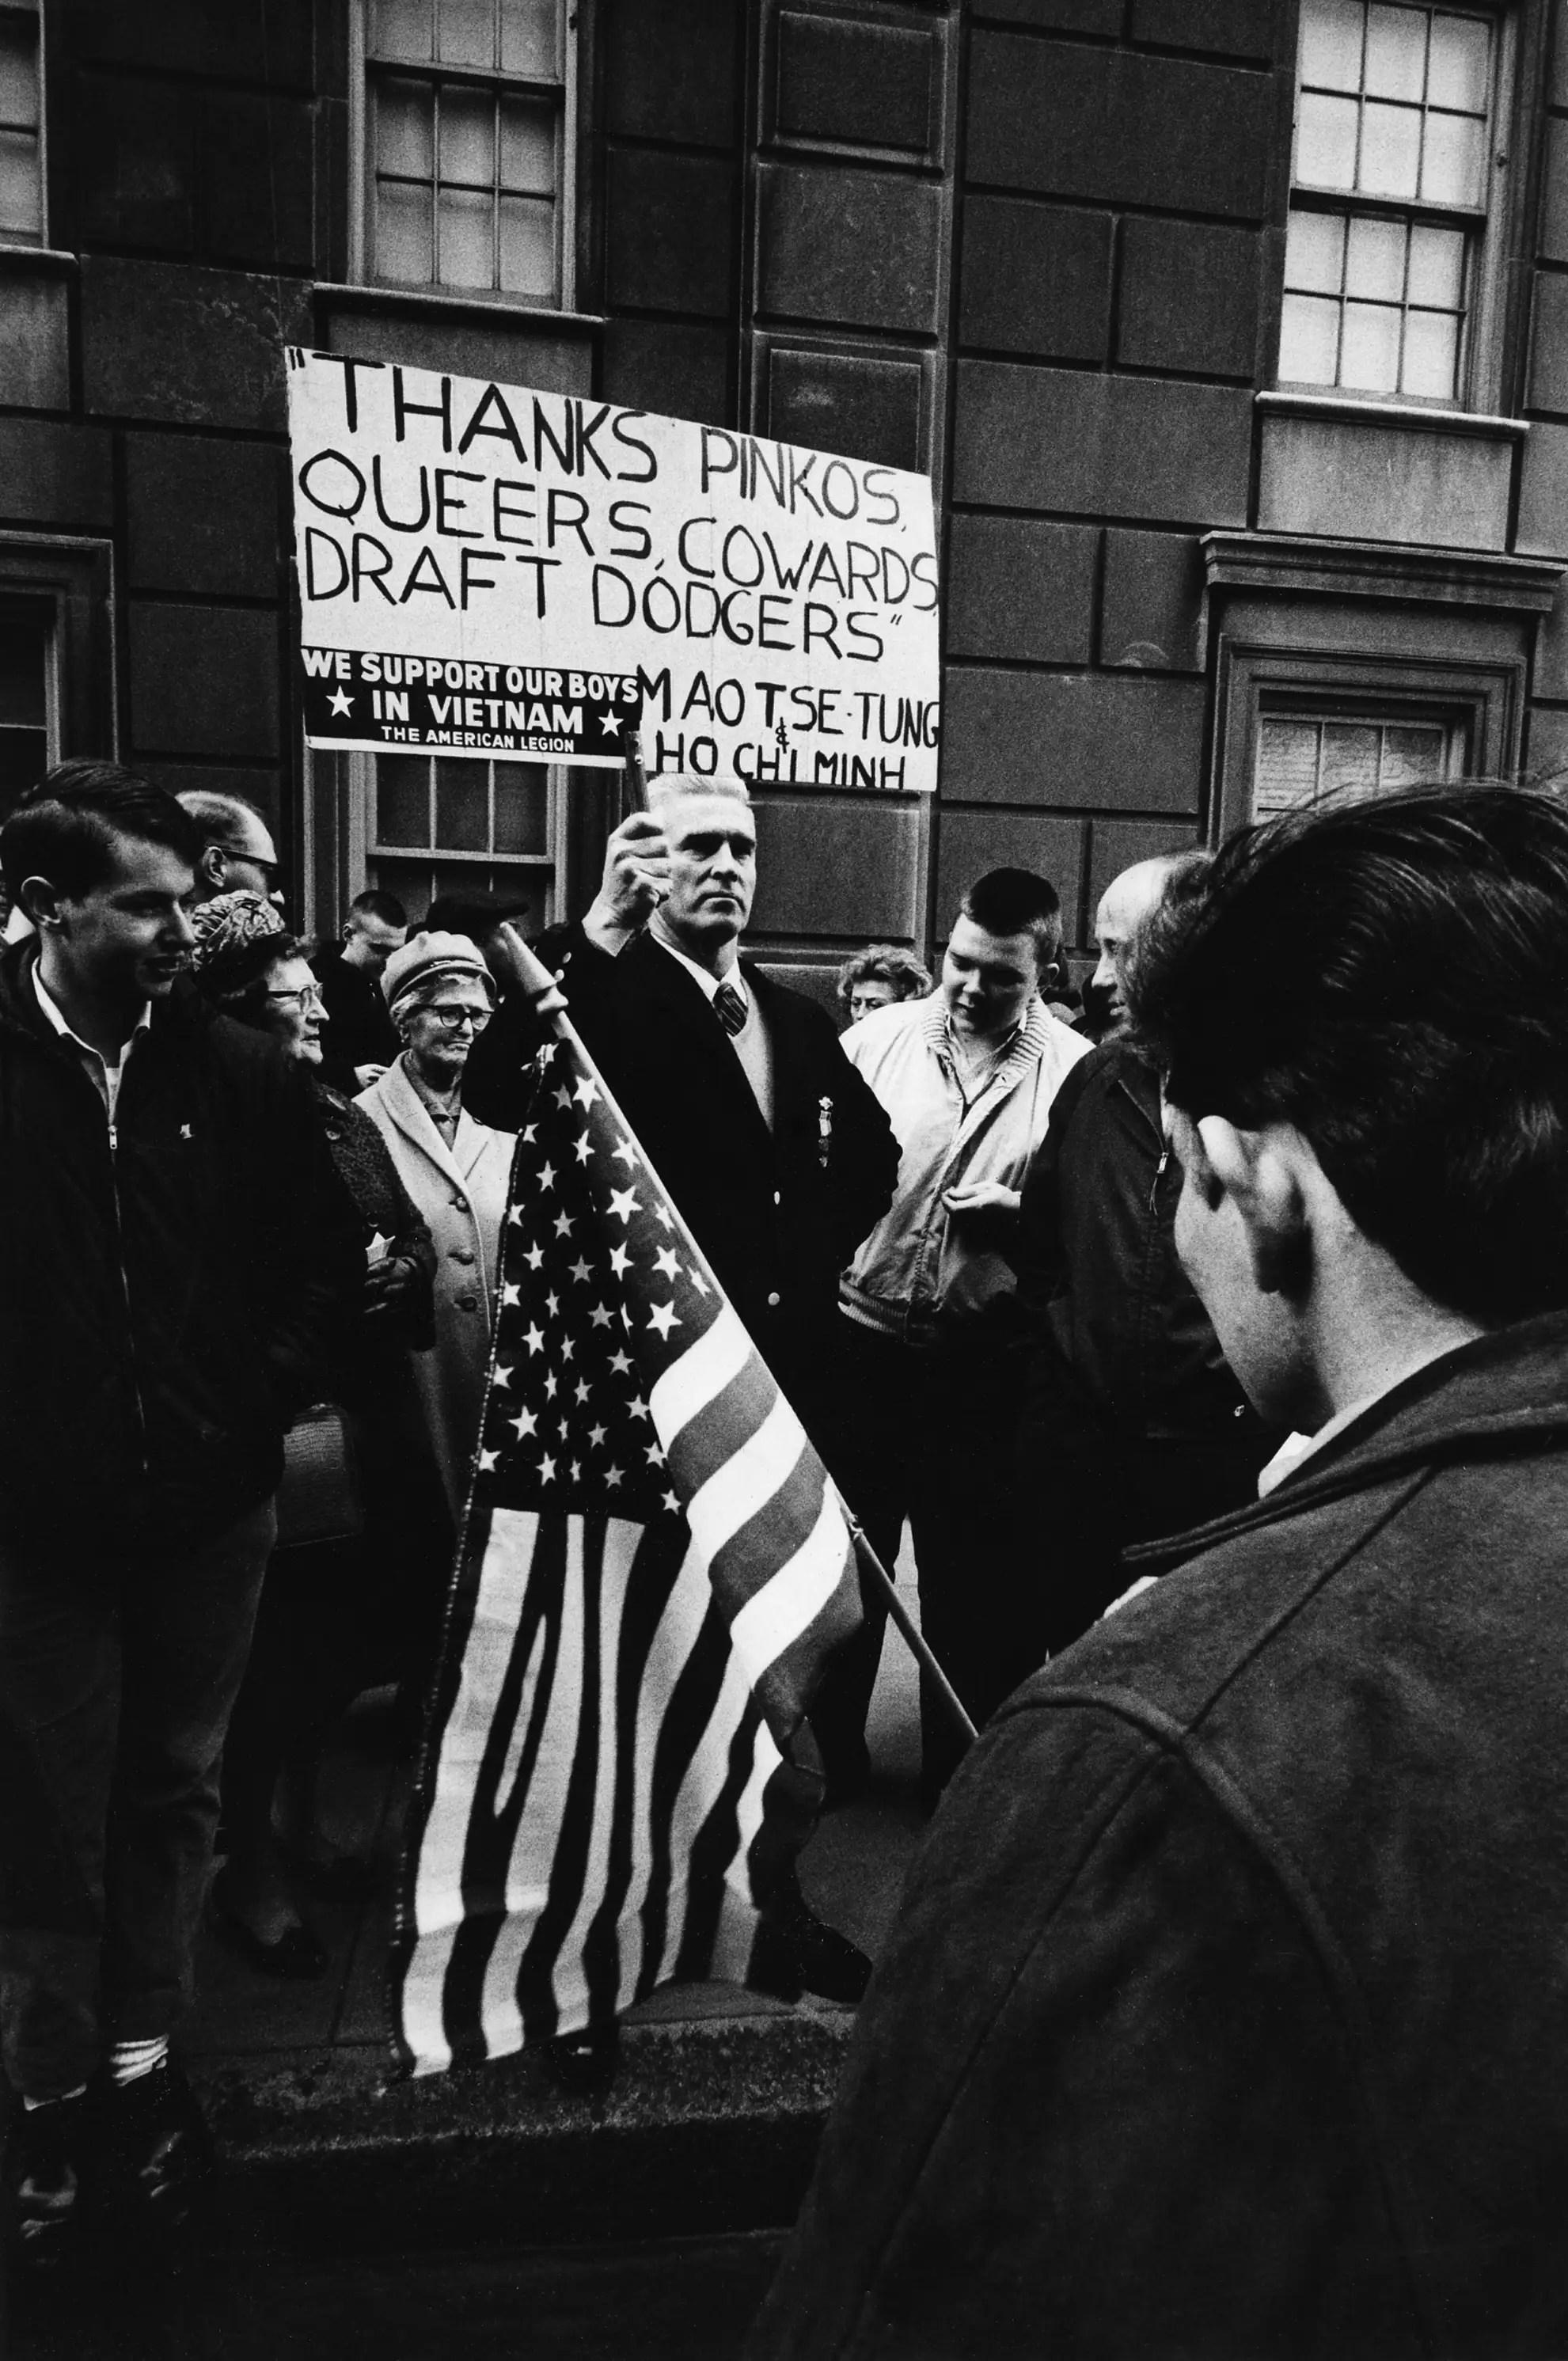 Incredible Vintage S Protest Photos